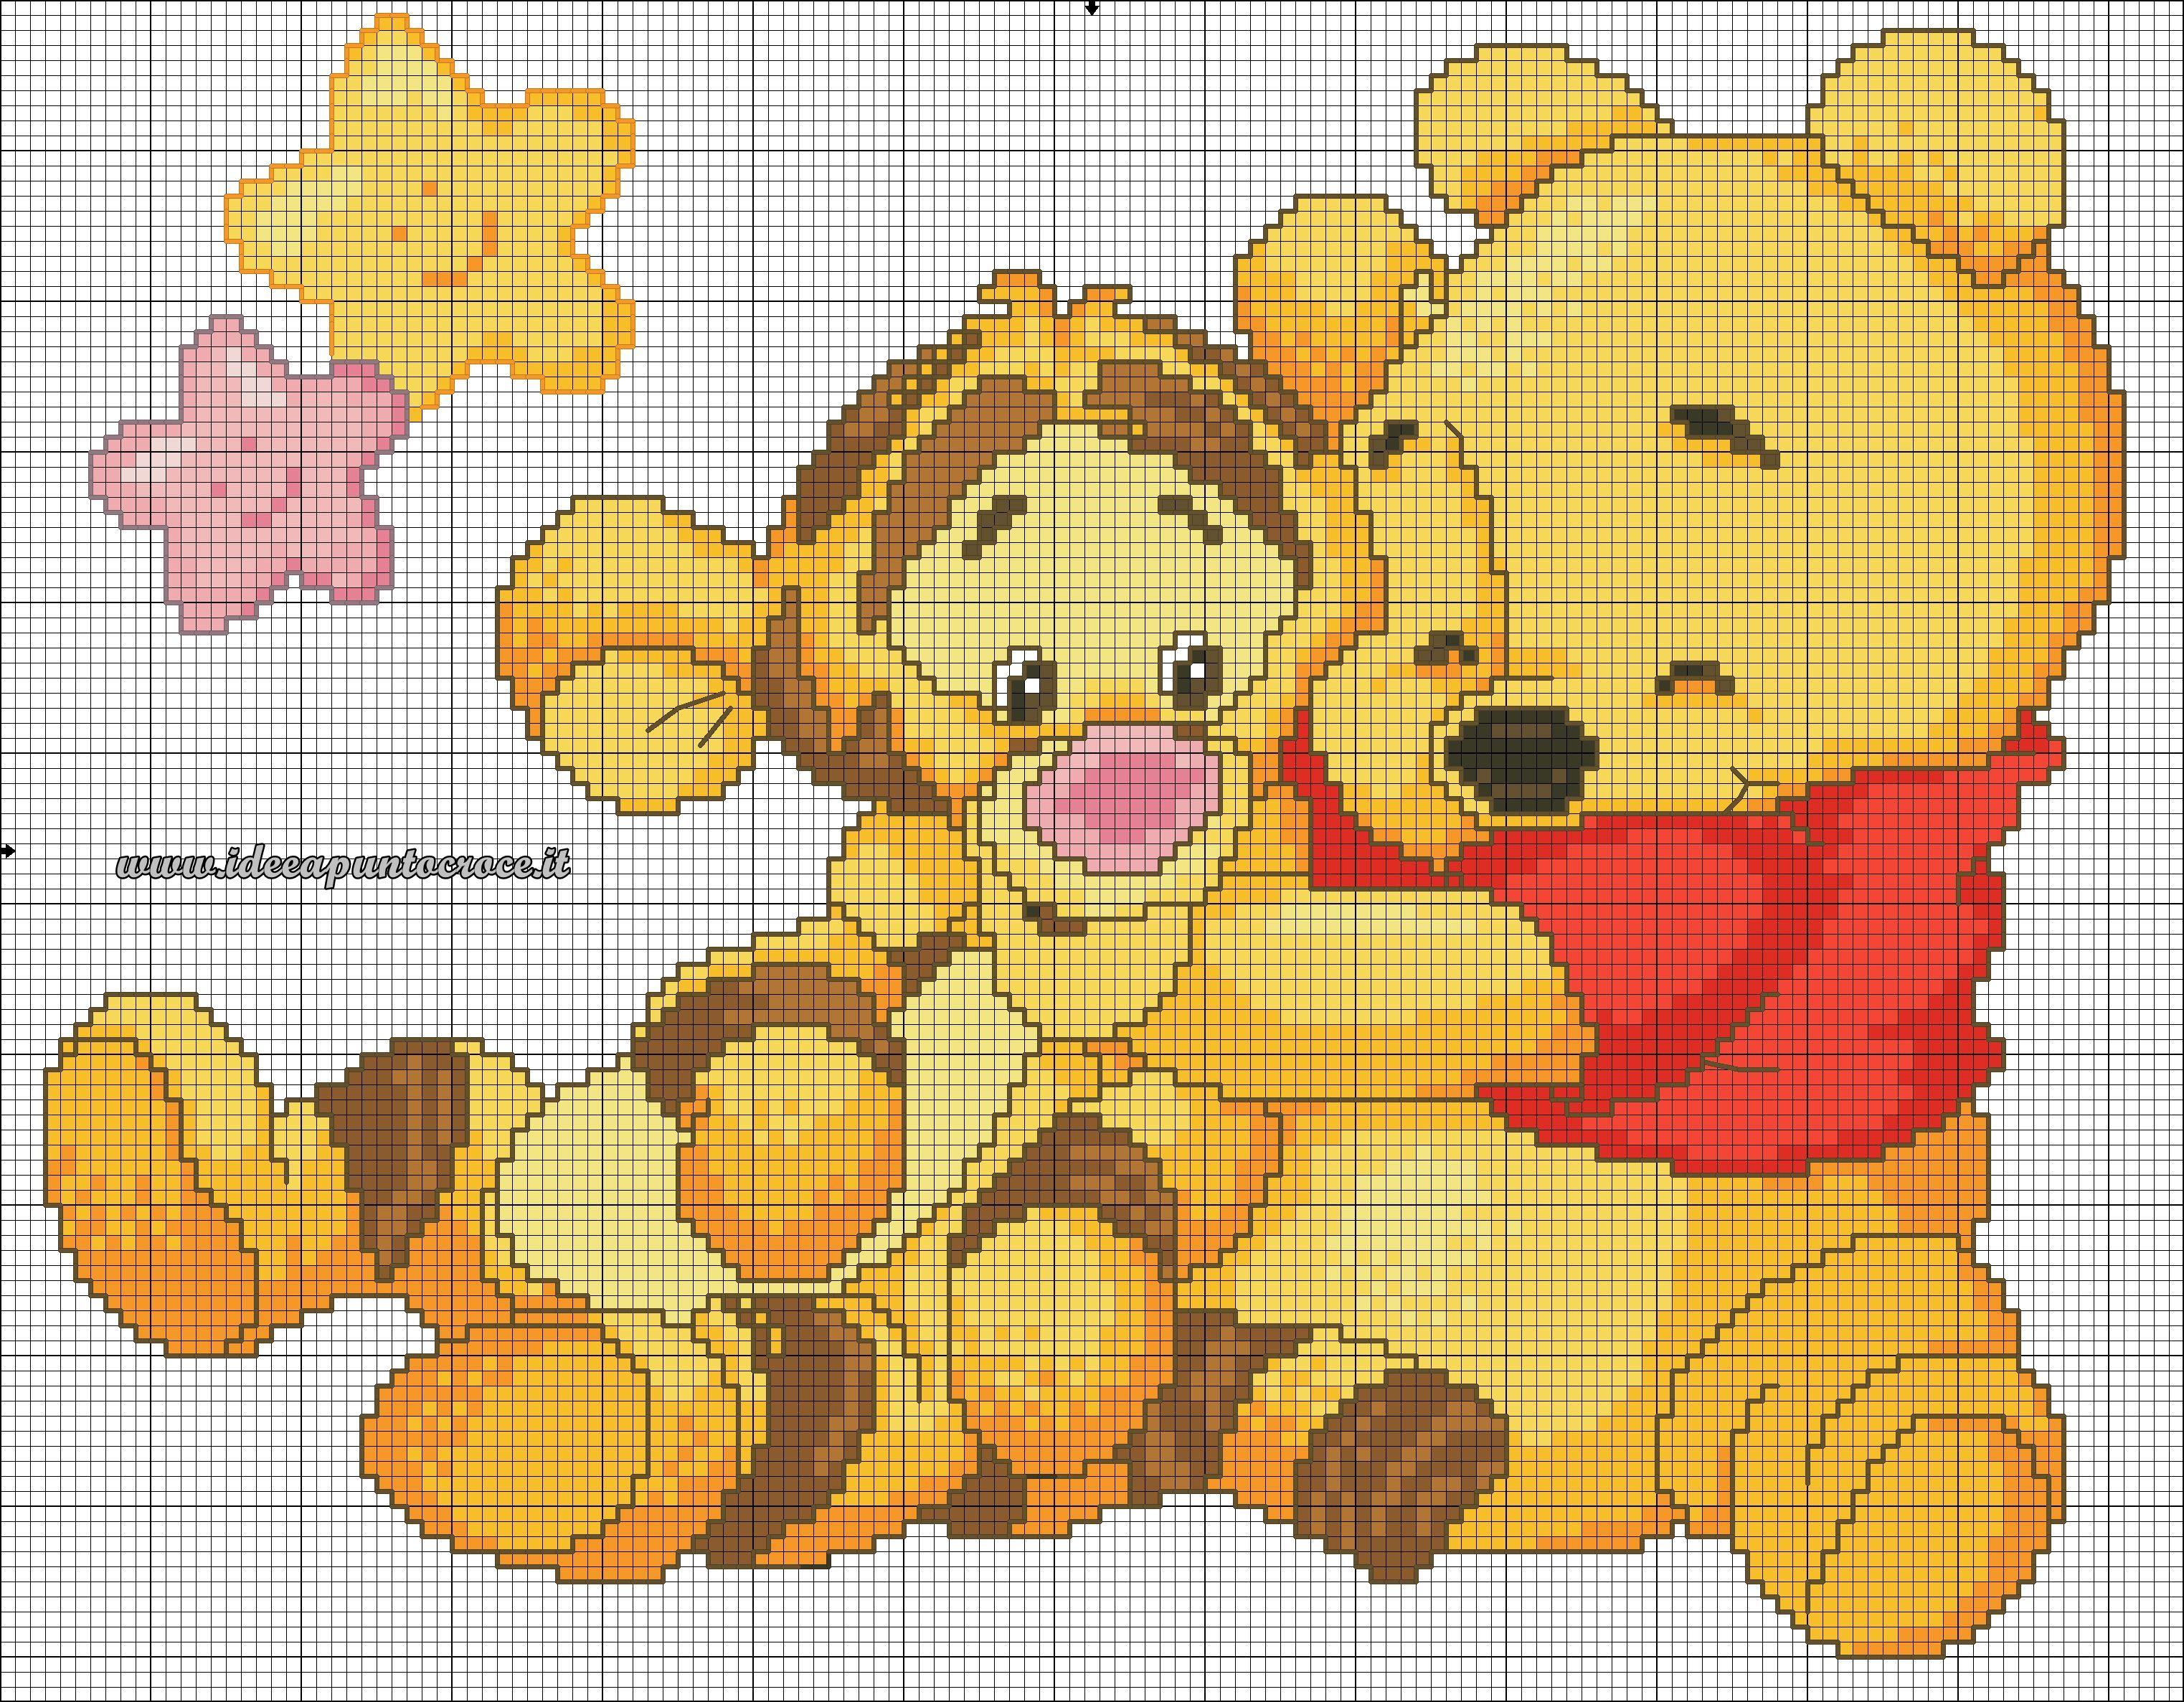 tigro winnie the pooh acolore